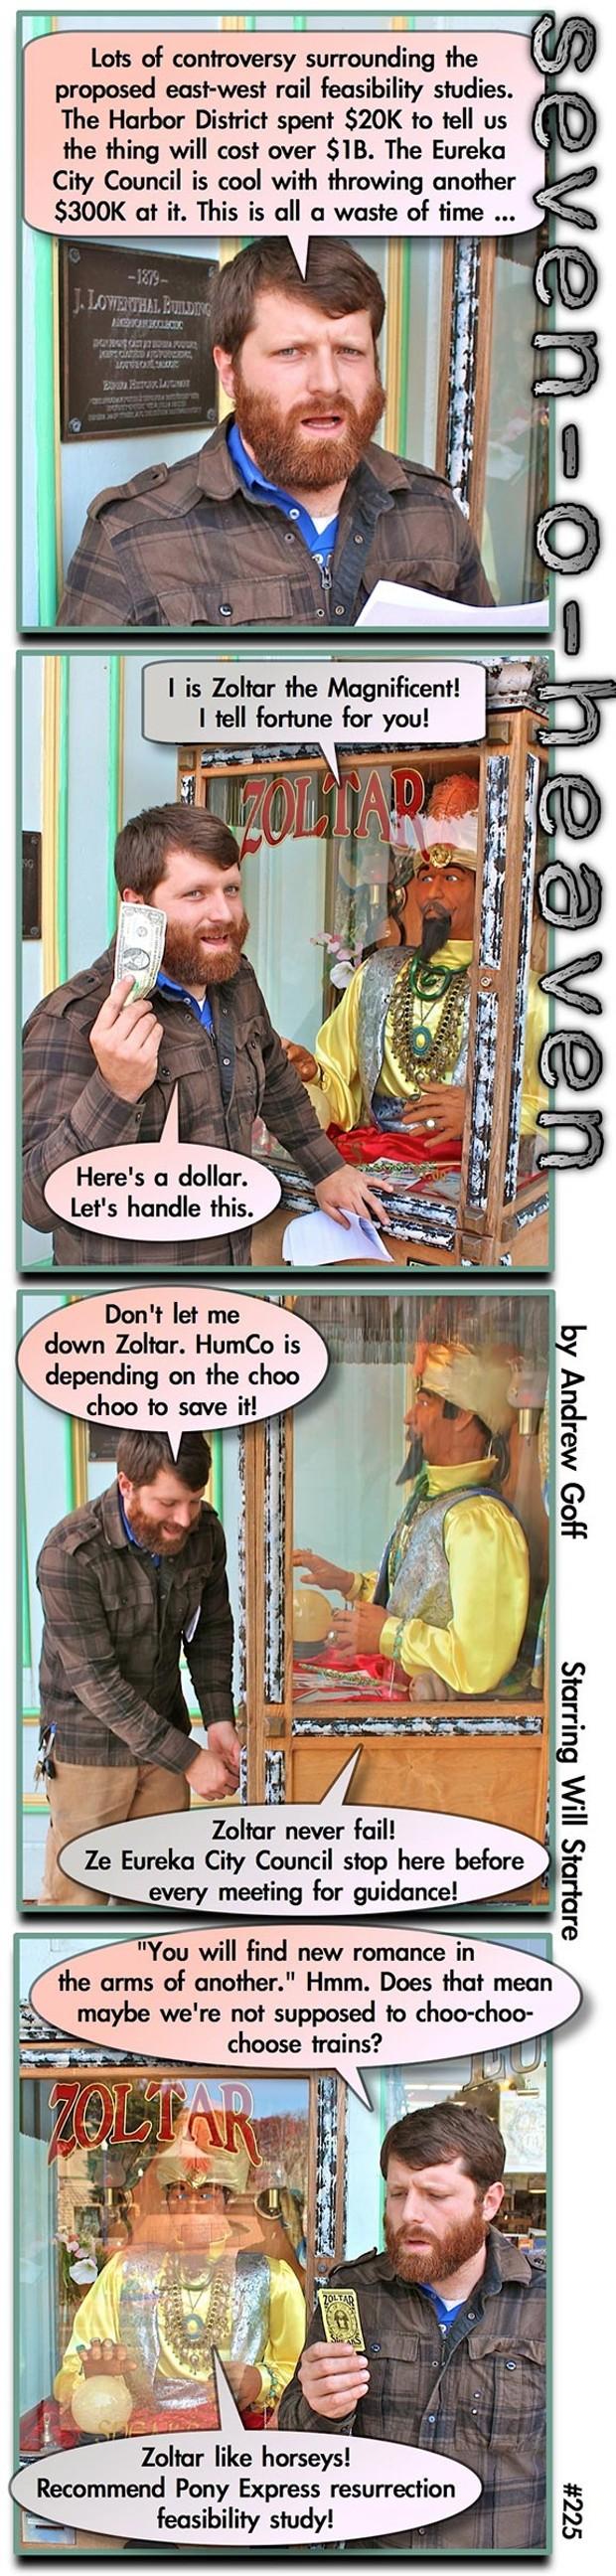 Zoltar Tells a Fortune